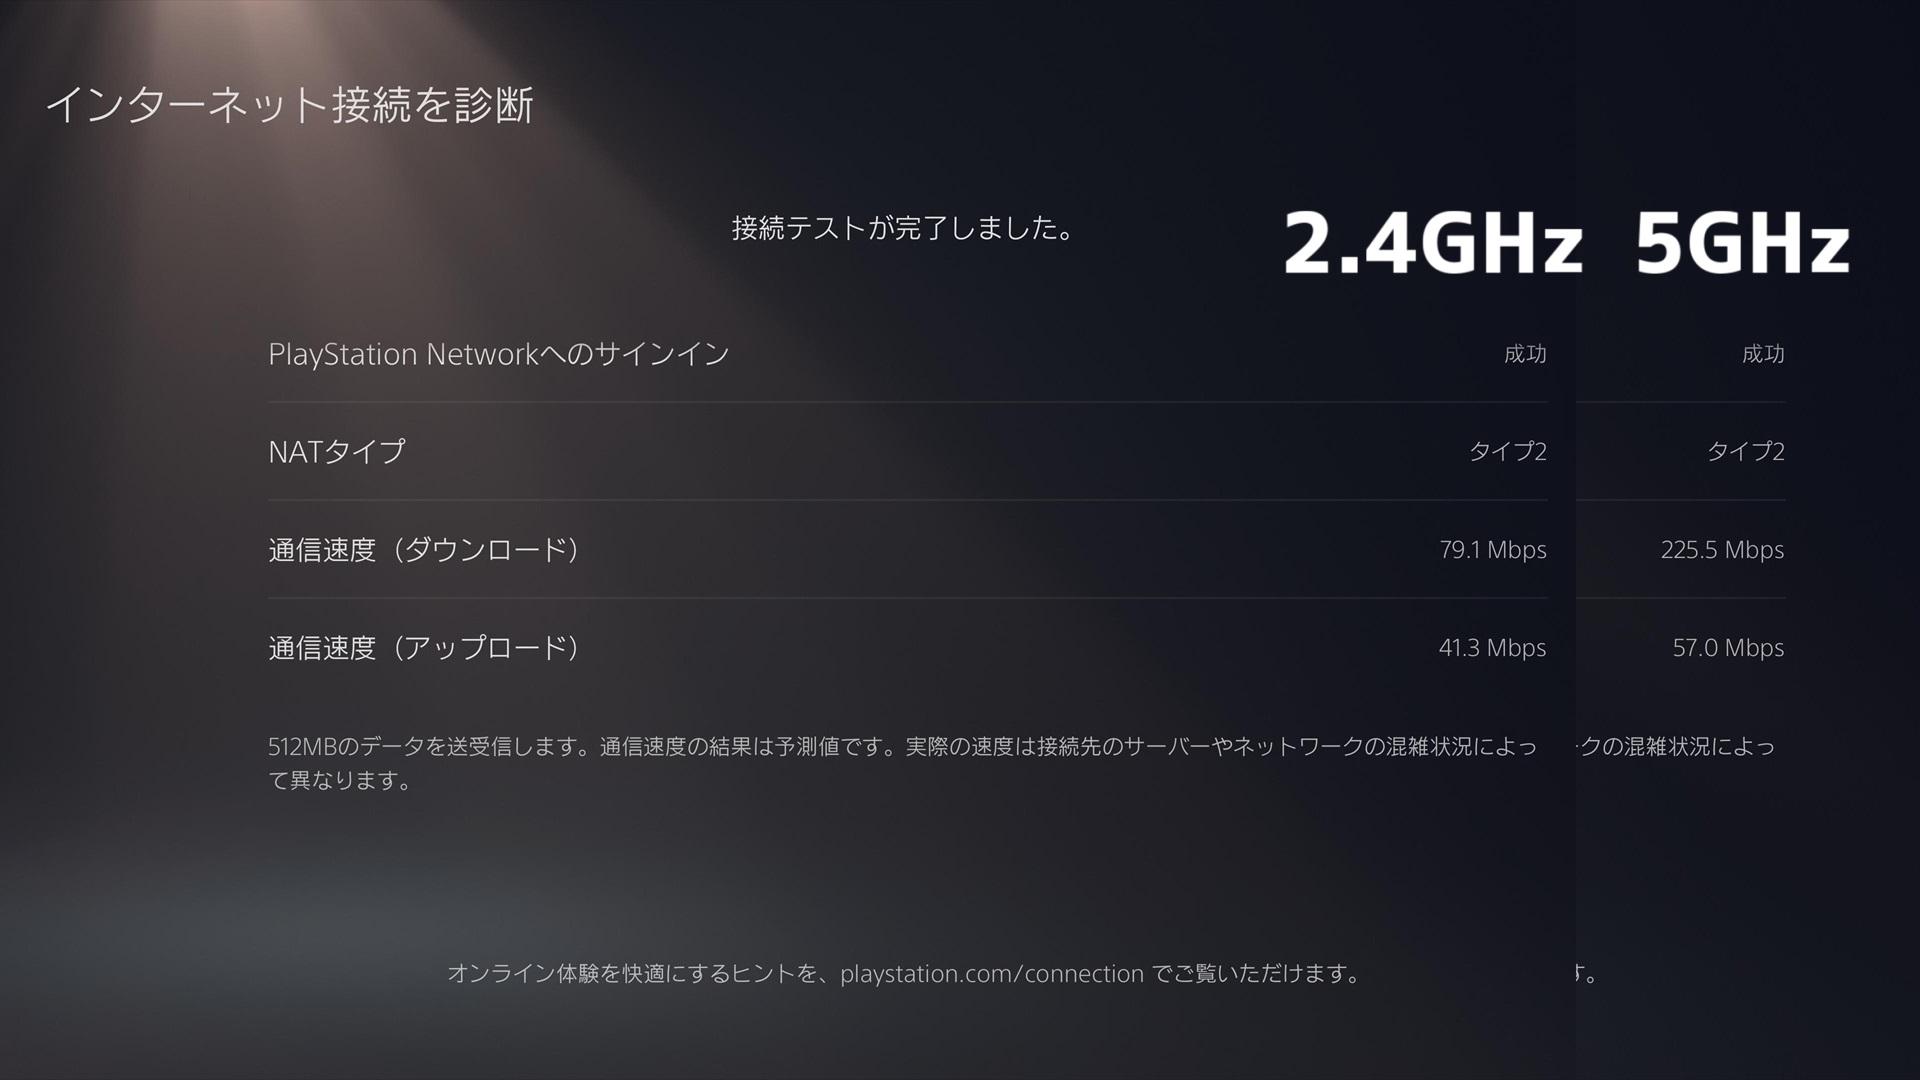 2.4GHz ダウンロード:79.1Mbps、アップロード:41.3Mbps 5GHz(wifi6) ダウンロード:225.5Mbps、アップロード:57.0Mbps